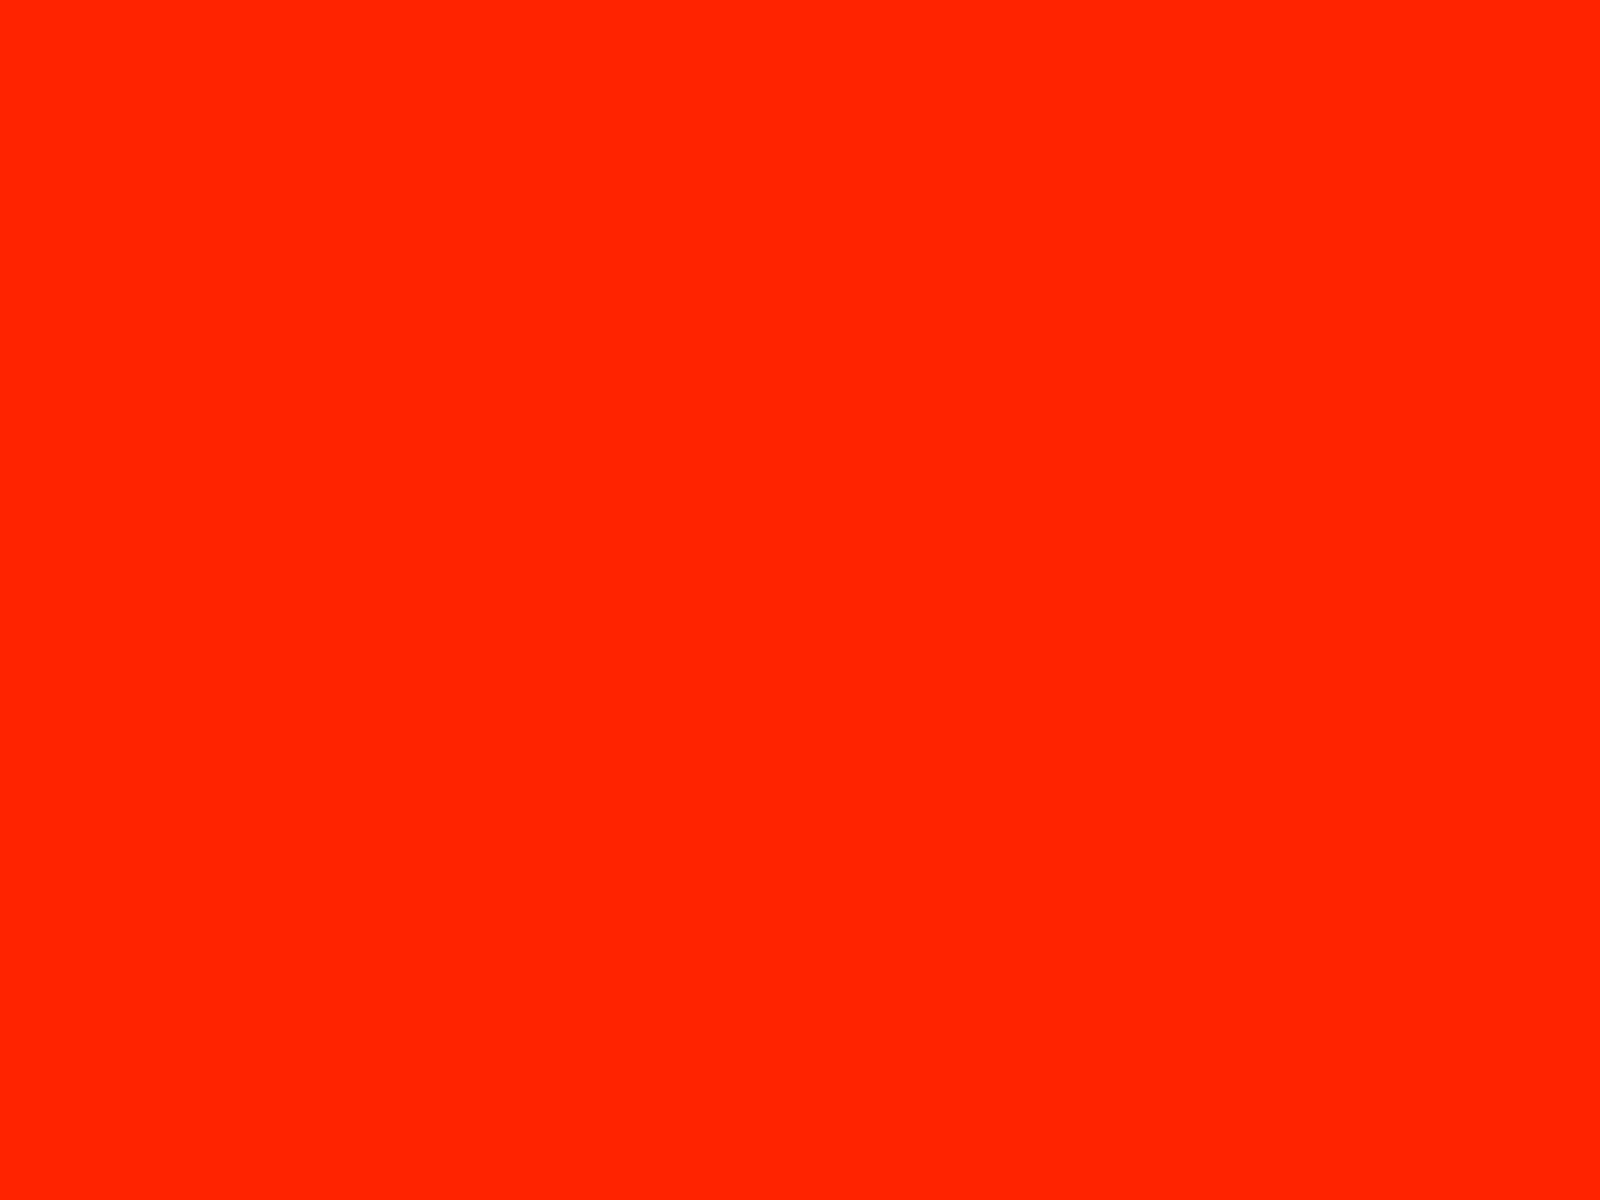 1600x1200 Scarlet Solid Color Background